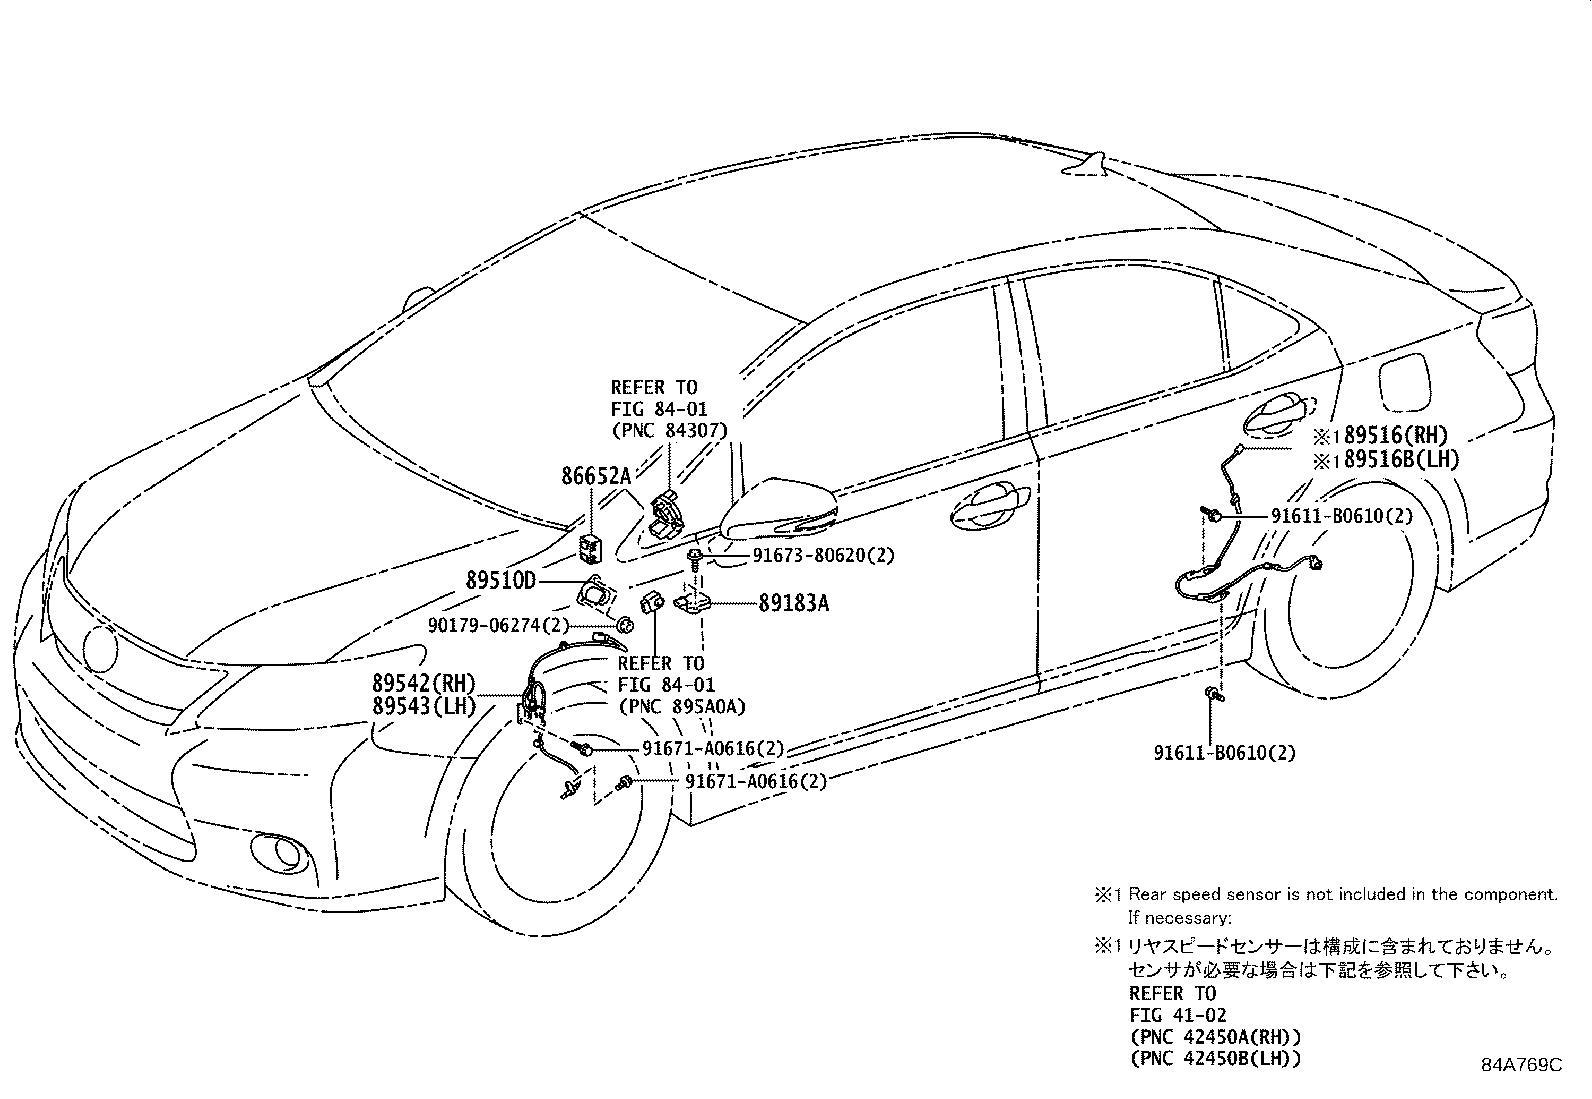 Lexus HS 250h Abs wheel speed sensor wiring harness (left